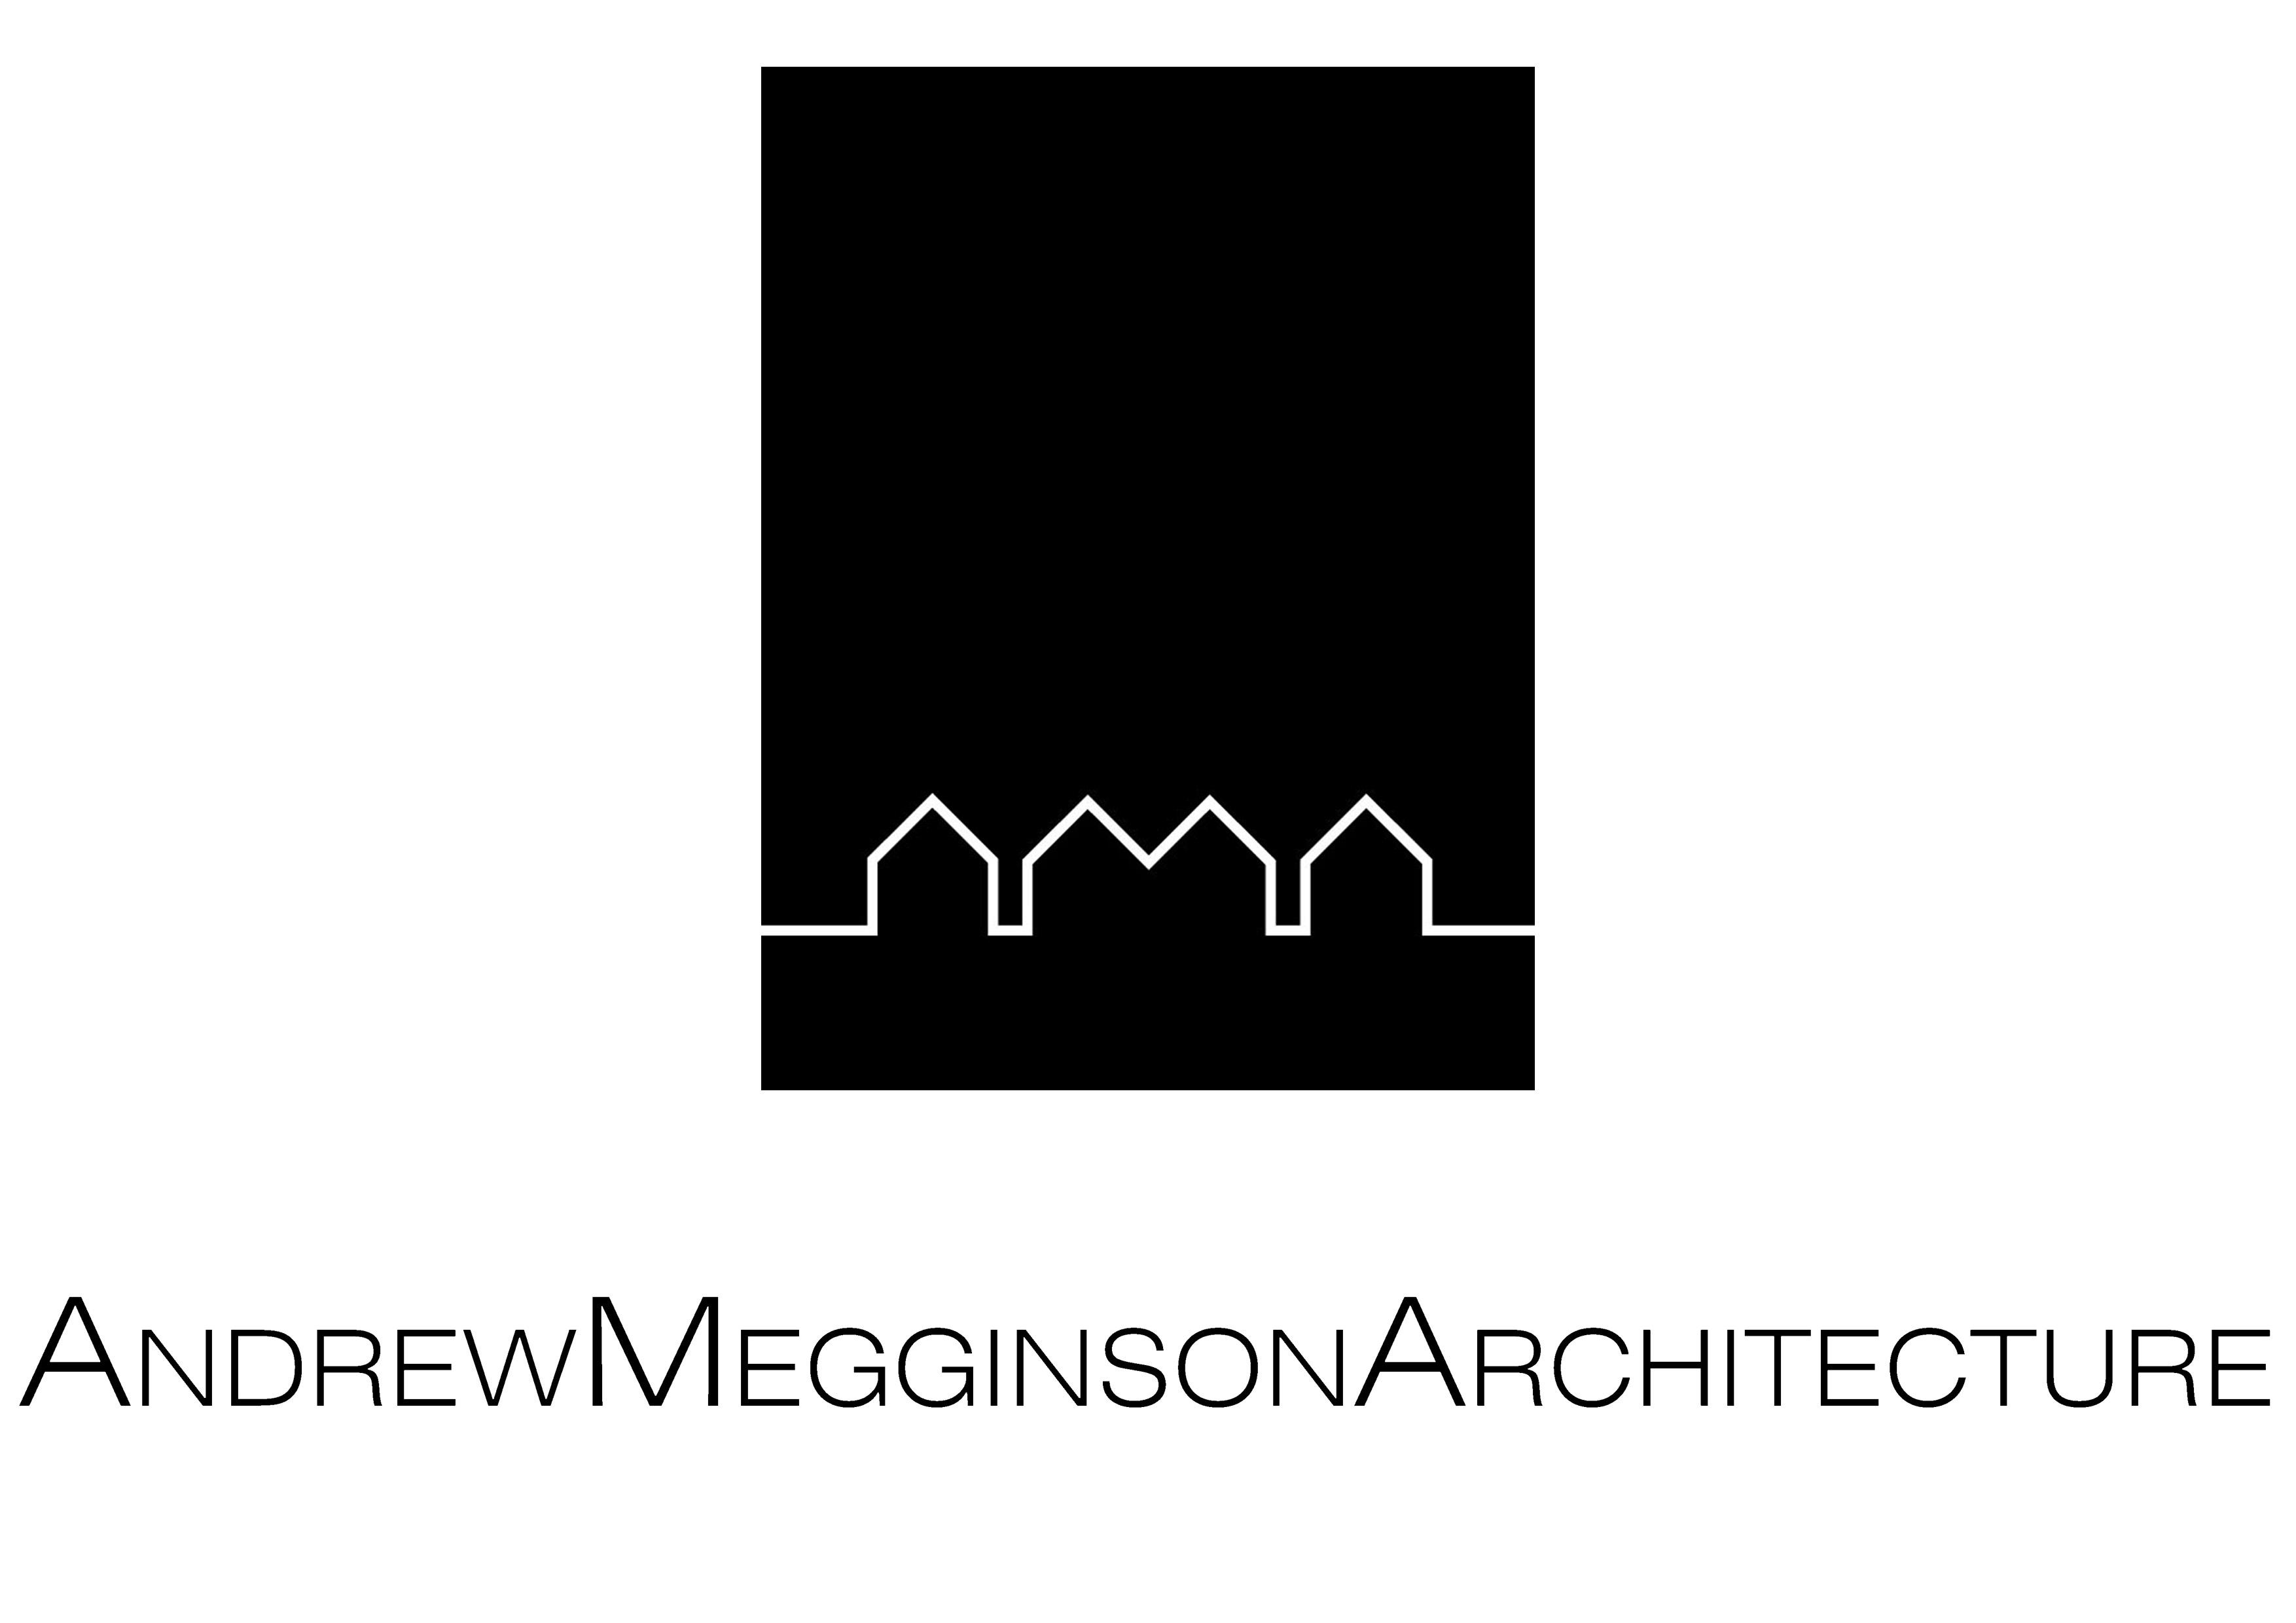 Andrew Megginson Architecture Logo